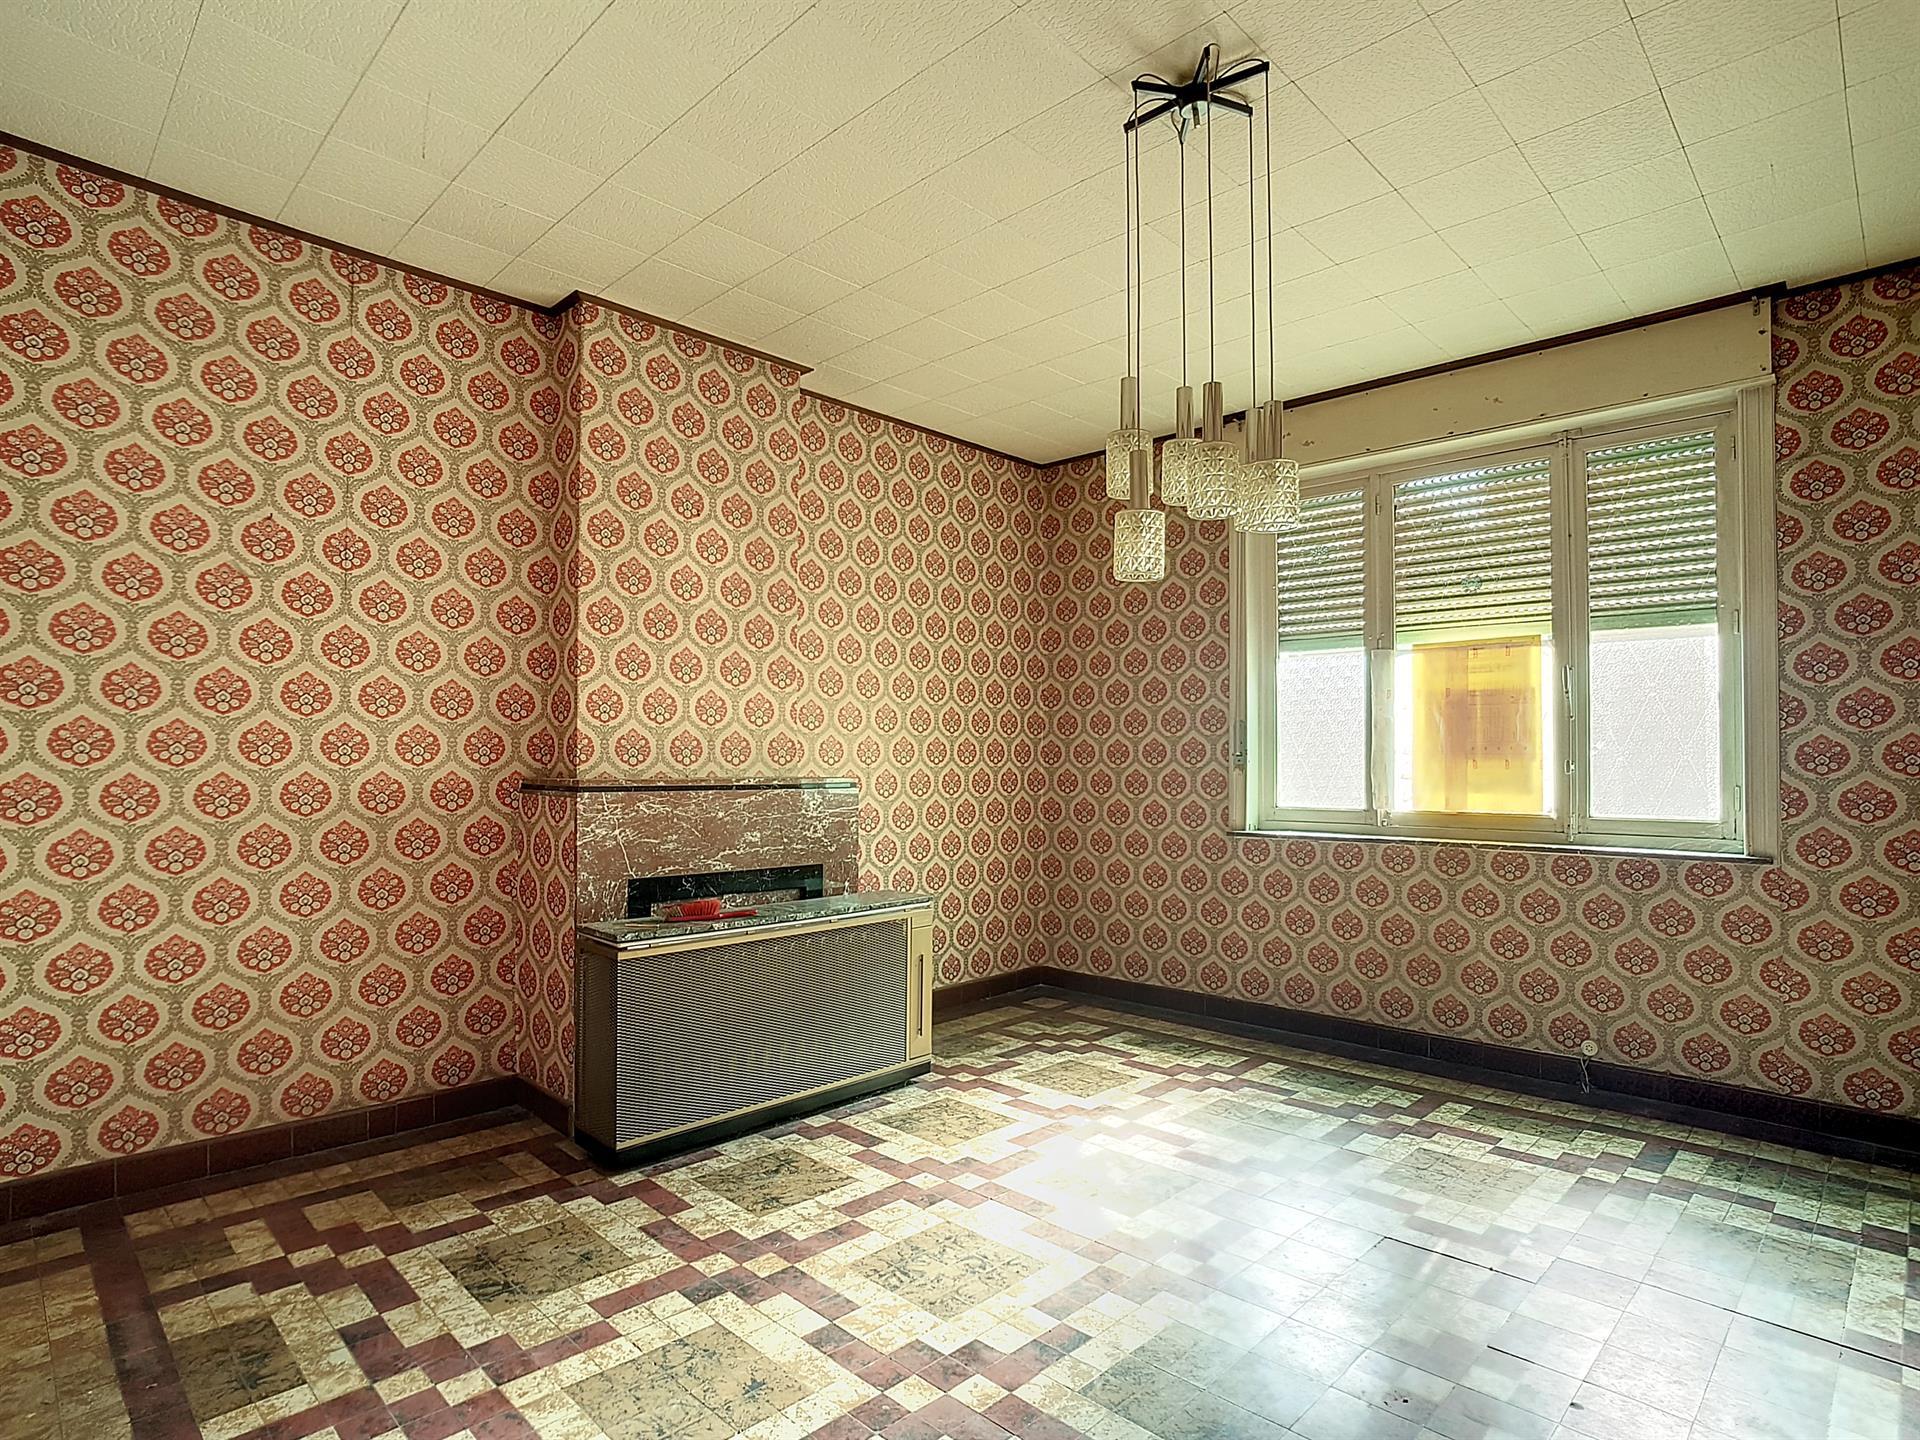 Maison - Zaventem Sterrebeek - #4507431-14